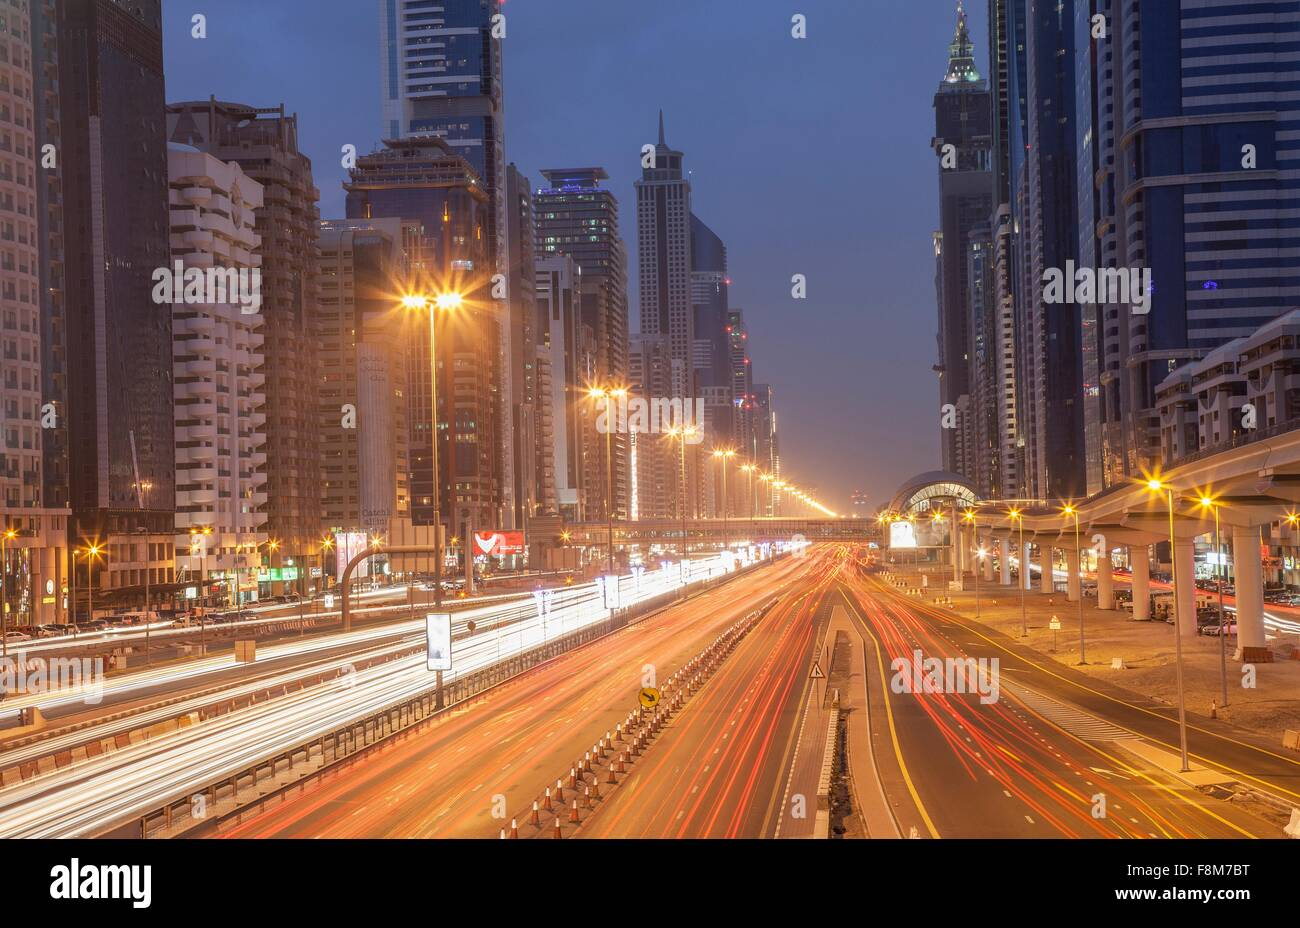 City highway and Dubai metro rail station at night, downtown Dubai, United Arab Emirates - Stock Image